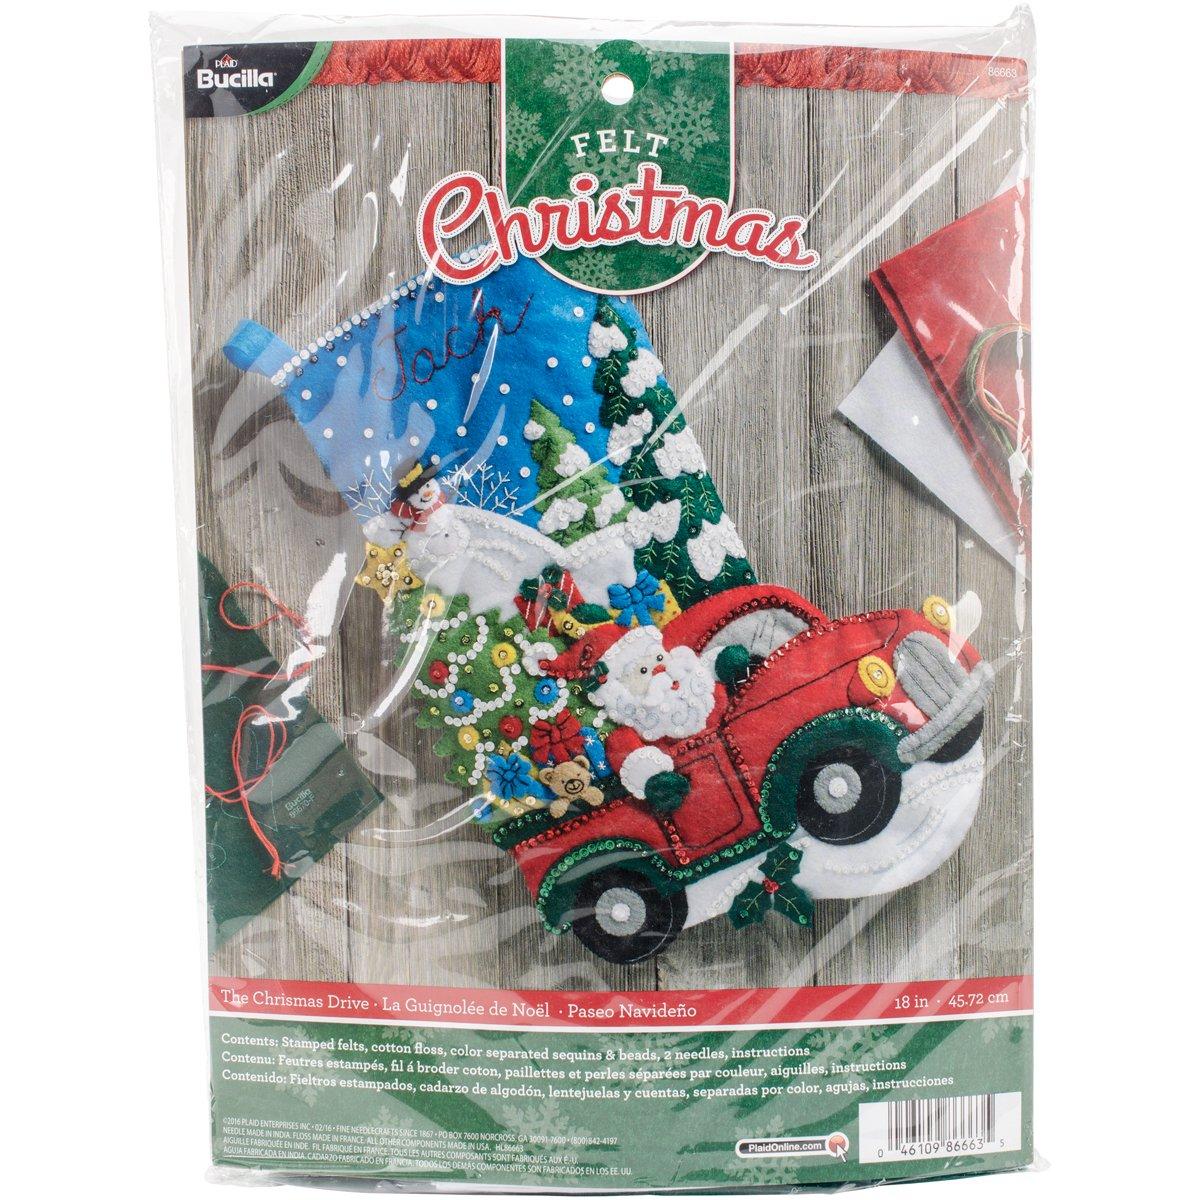 Bucilla 86663 Felt Applique Stocking Kit, The Christmas Drive, Size 18-Inch Plaid Inc